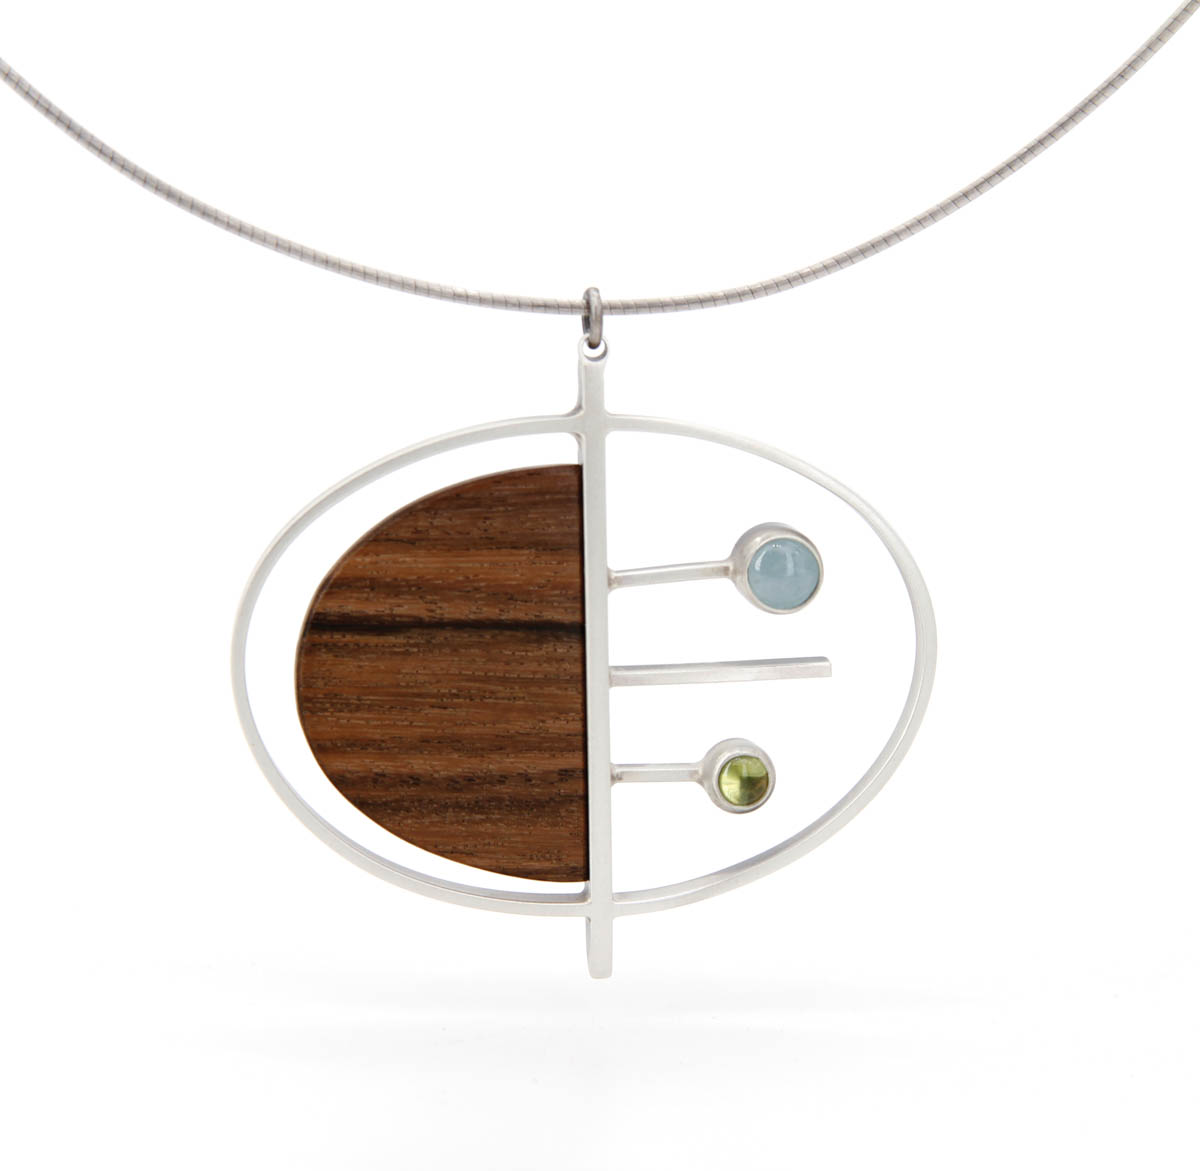 Mod Pendant Necklace. Matthew Smith, artist